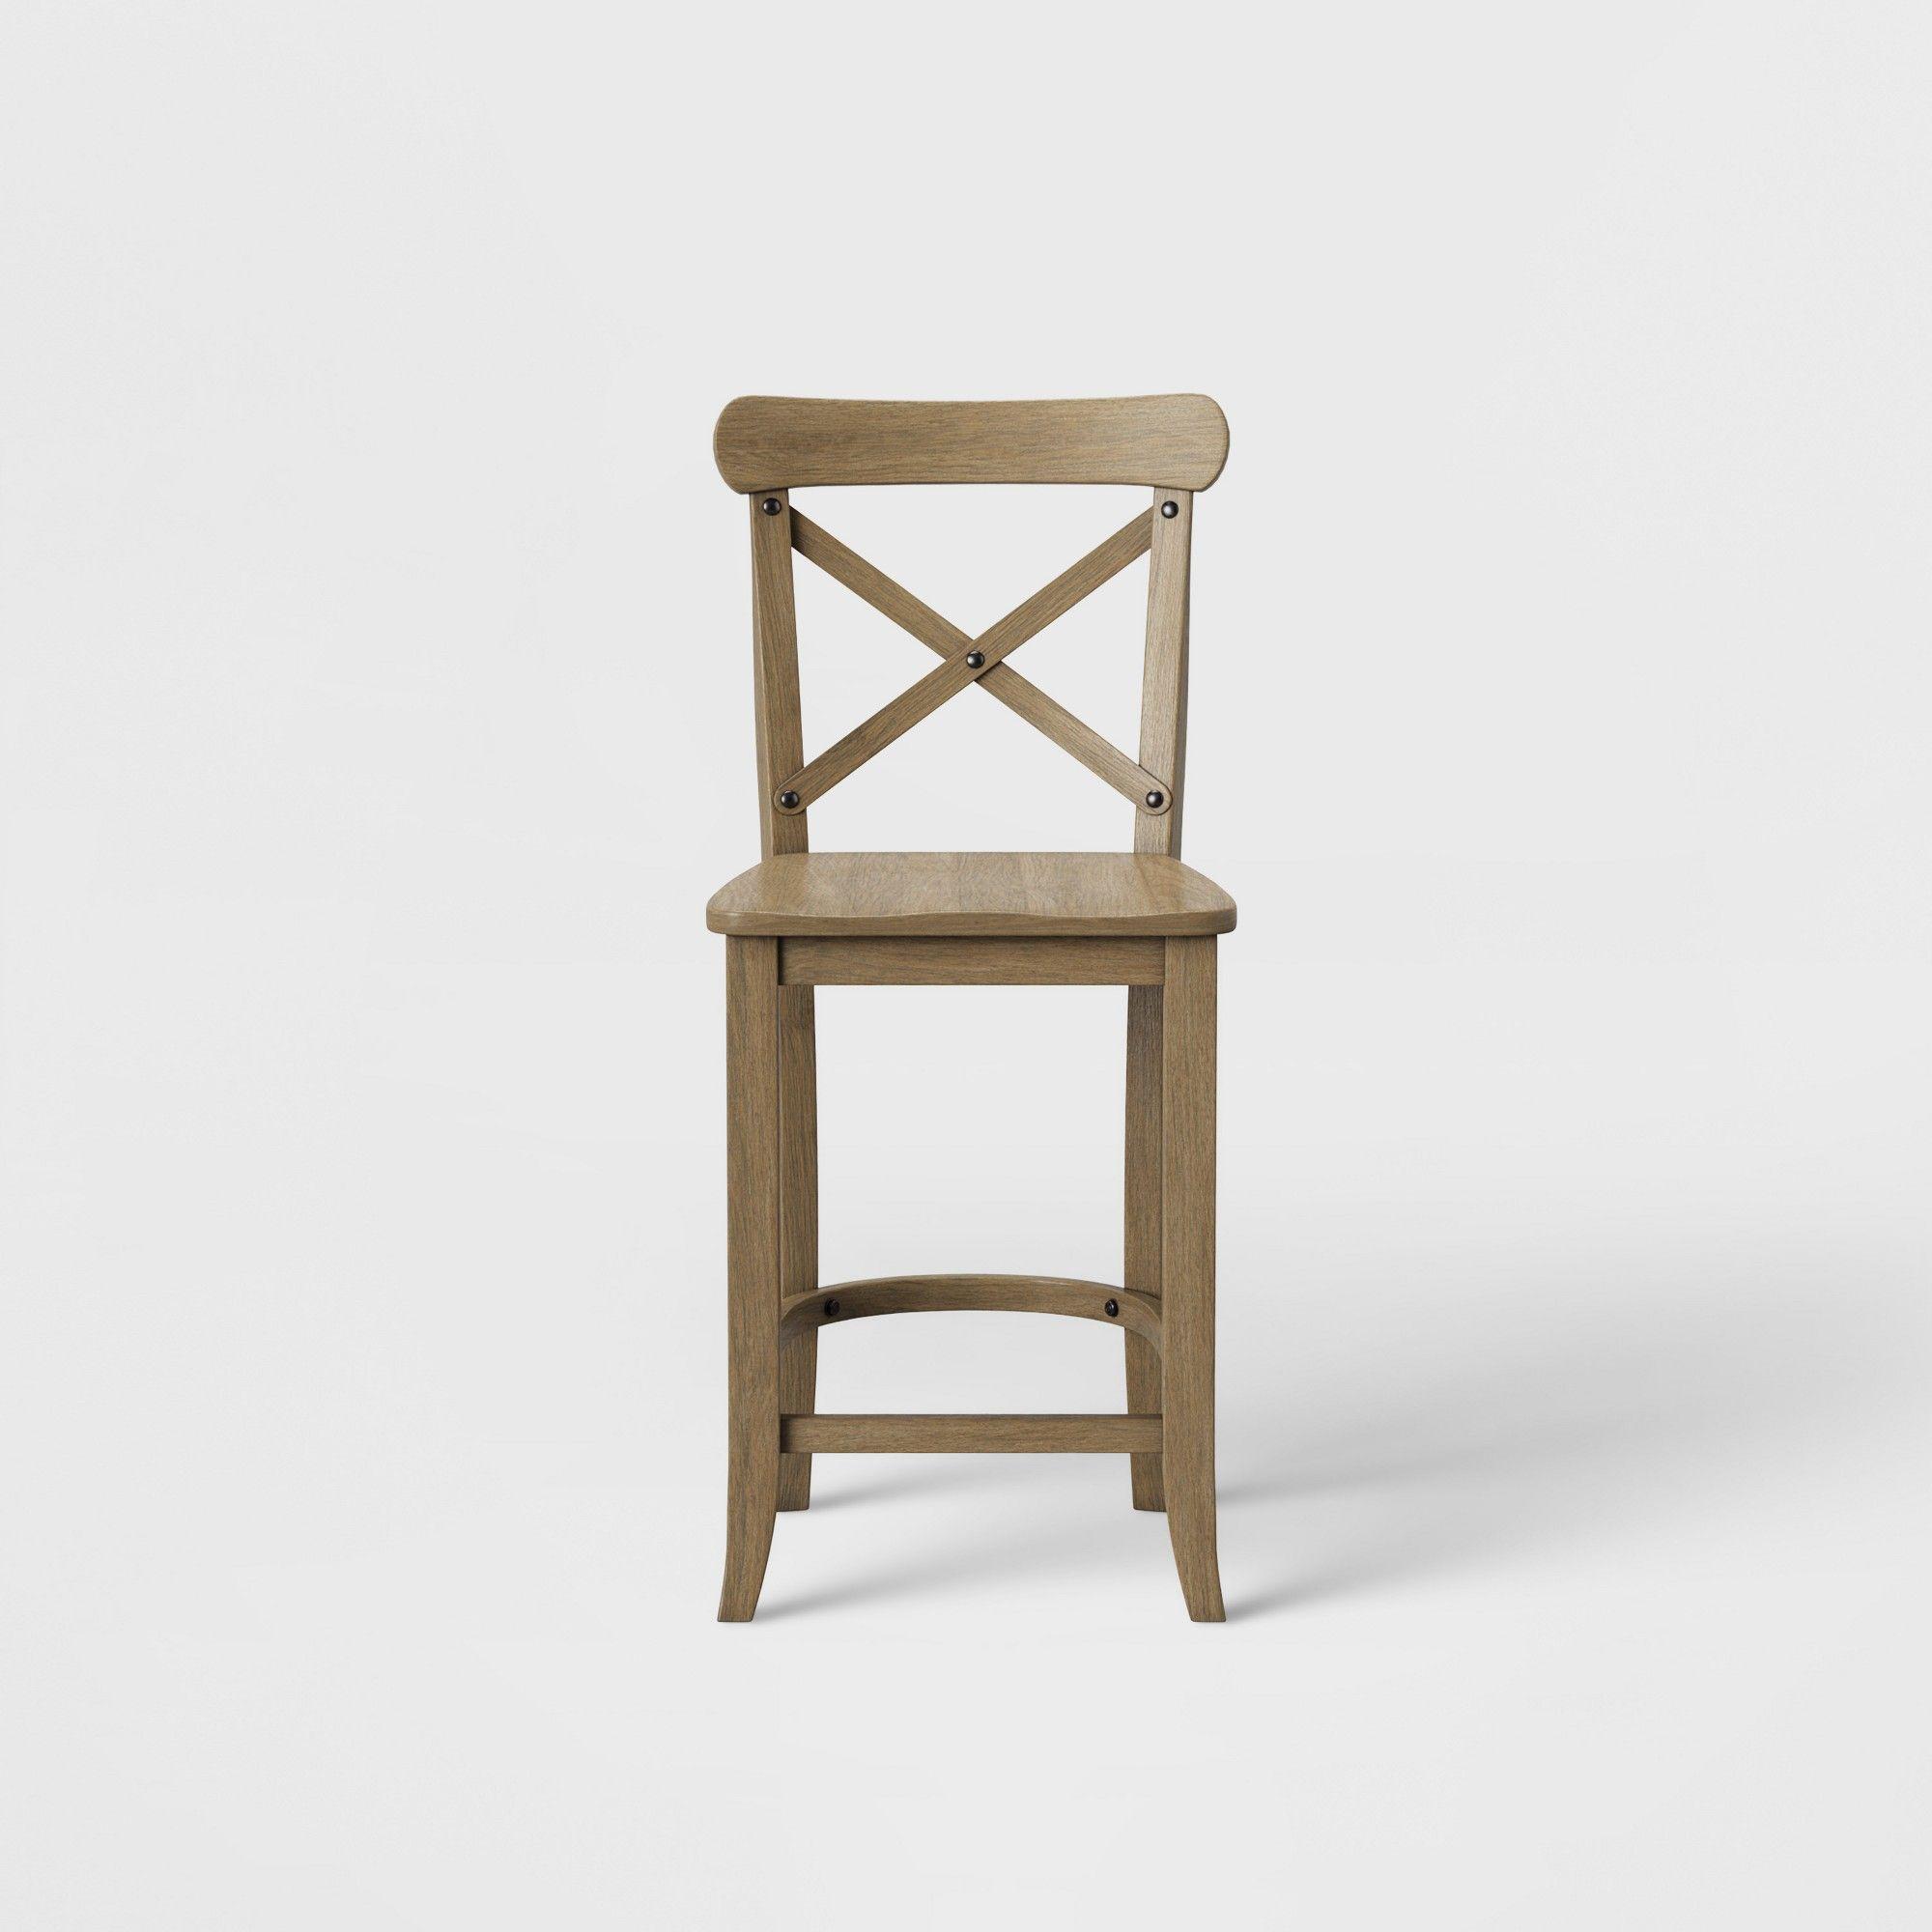 Tremendous 24 Litchfield X Back Counter Stool Driftwood Brown Creativecarmelina Interior Chair Design Creativecarmelinacom